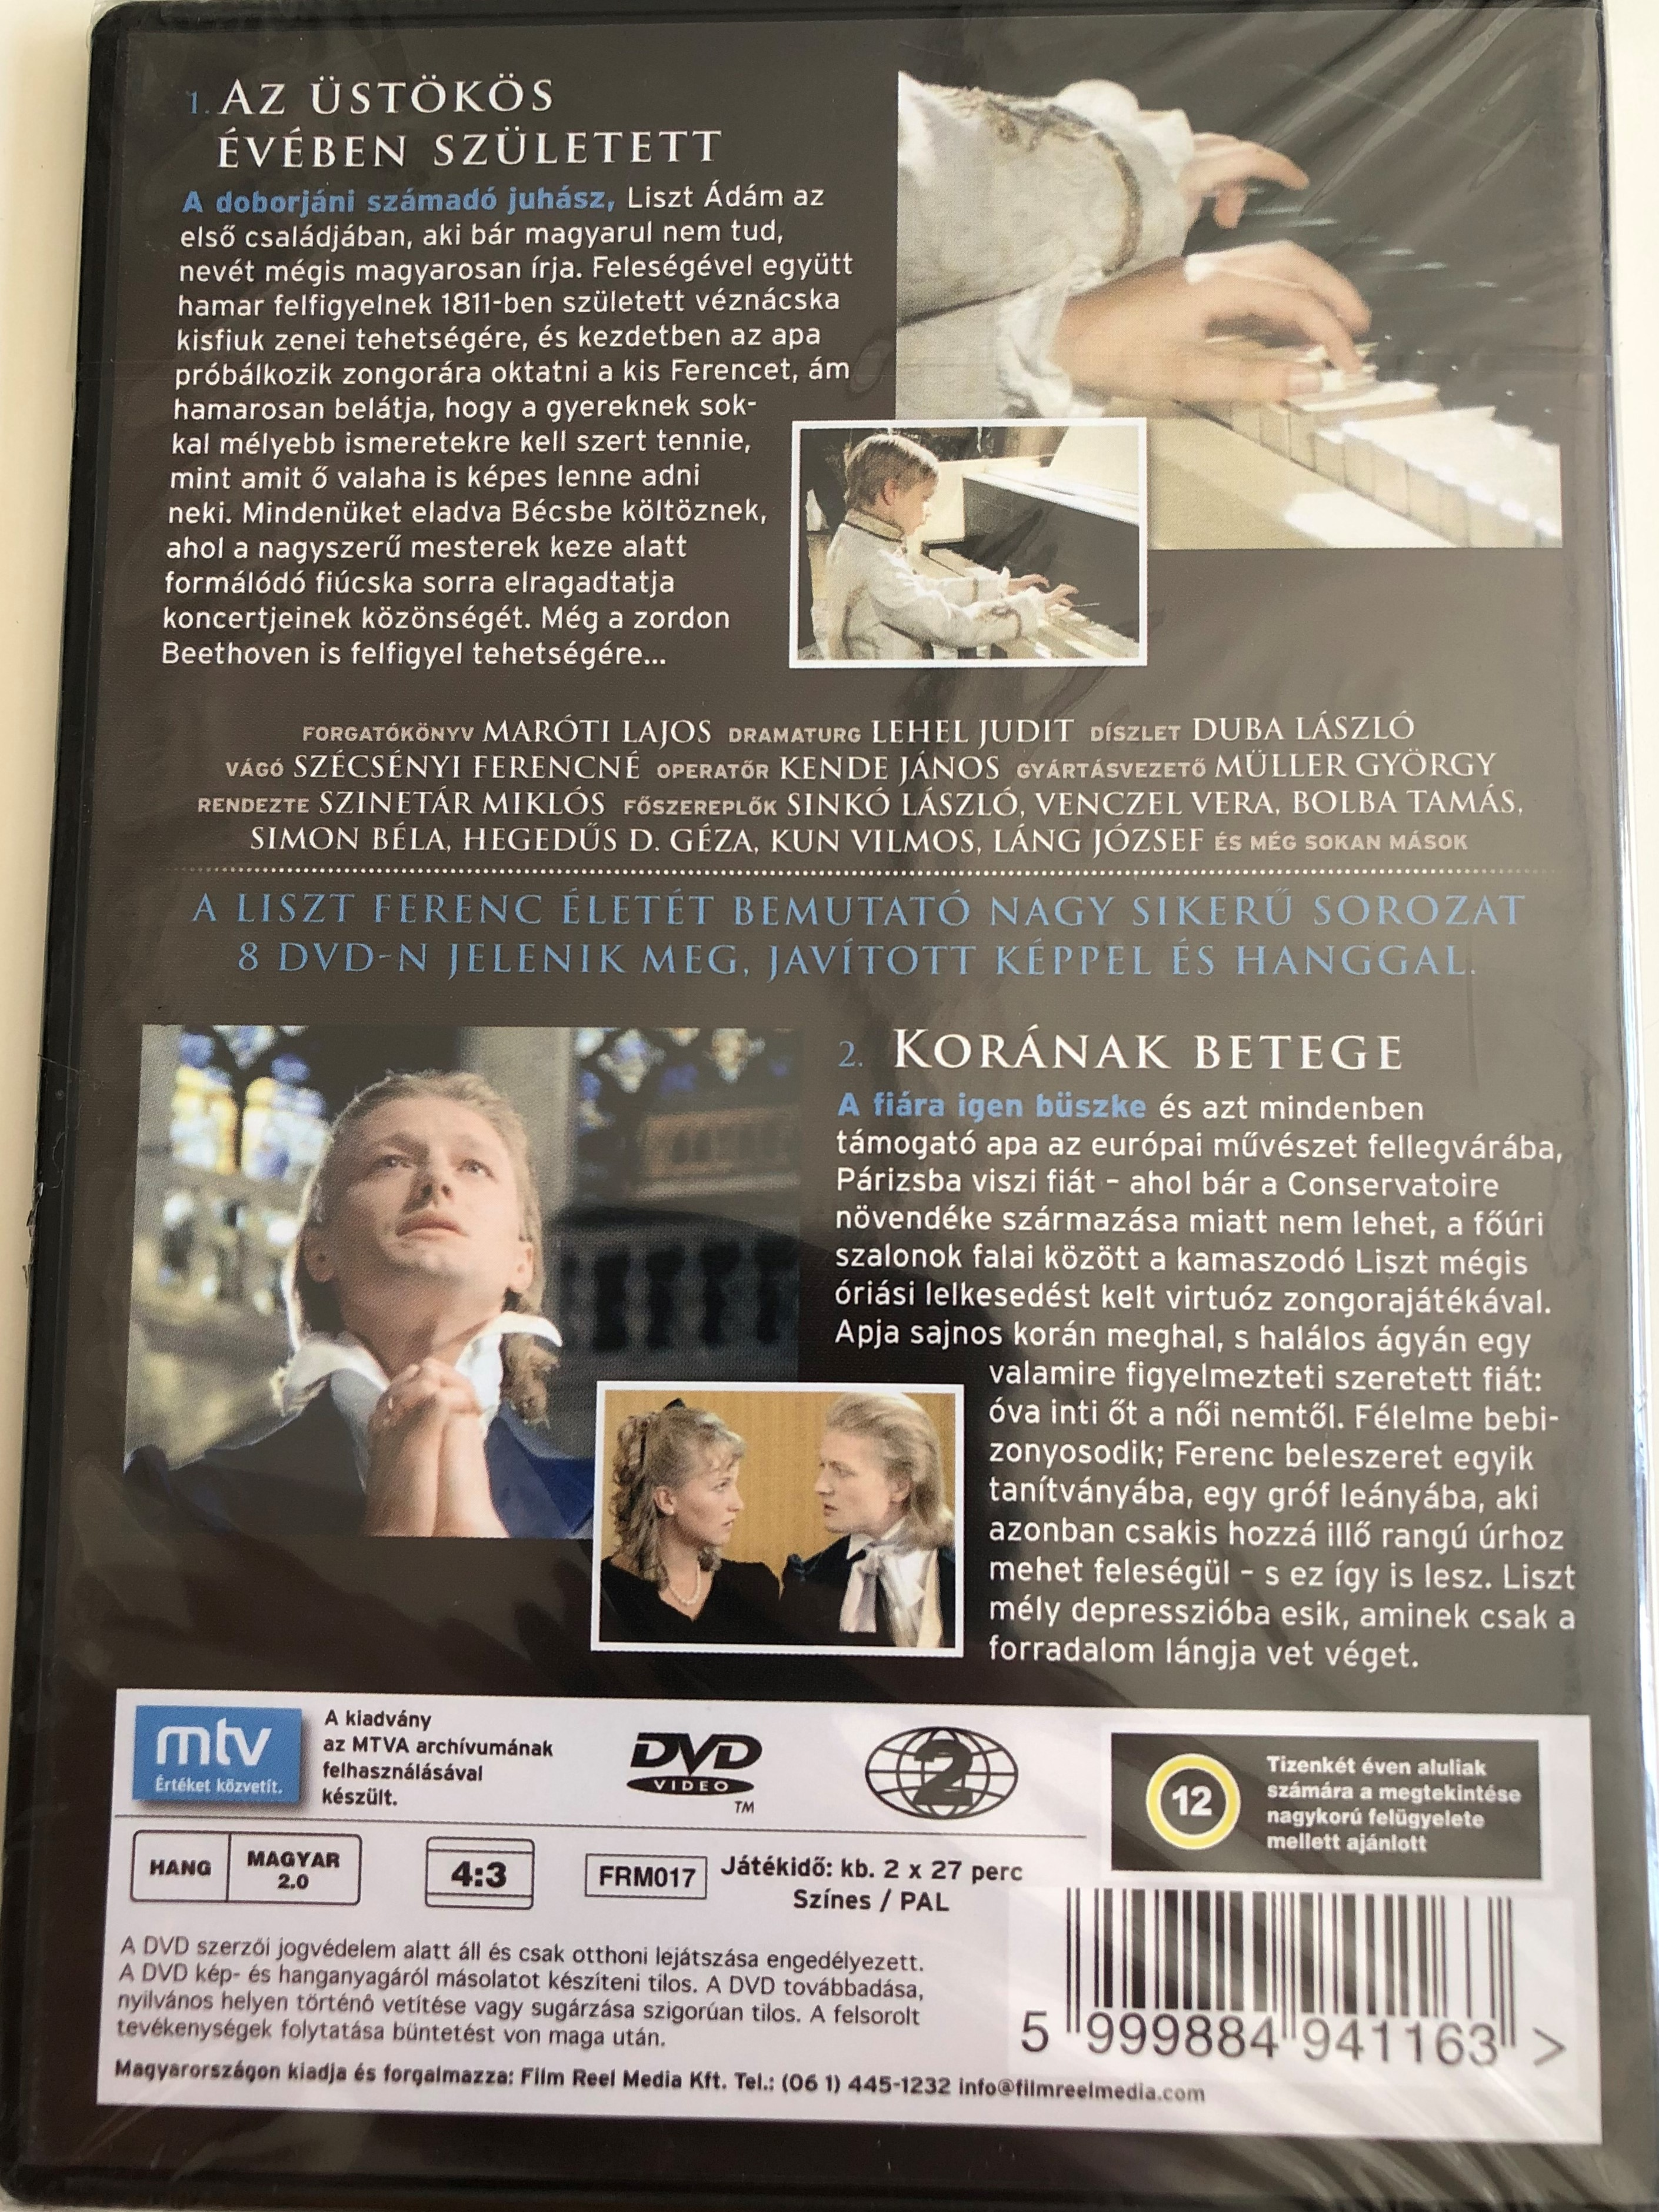 liszt-ferenc-tv-series-dvd-1982-directed-by-szinet-r-mikl-s-starring-sink-l-szl-venczel-vera-bolba-tam-s-heged-s-d.-g-za-mtva-episodes-1-2-2-.jpg